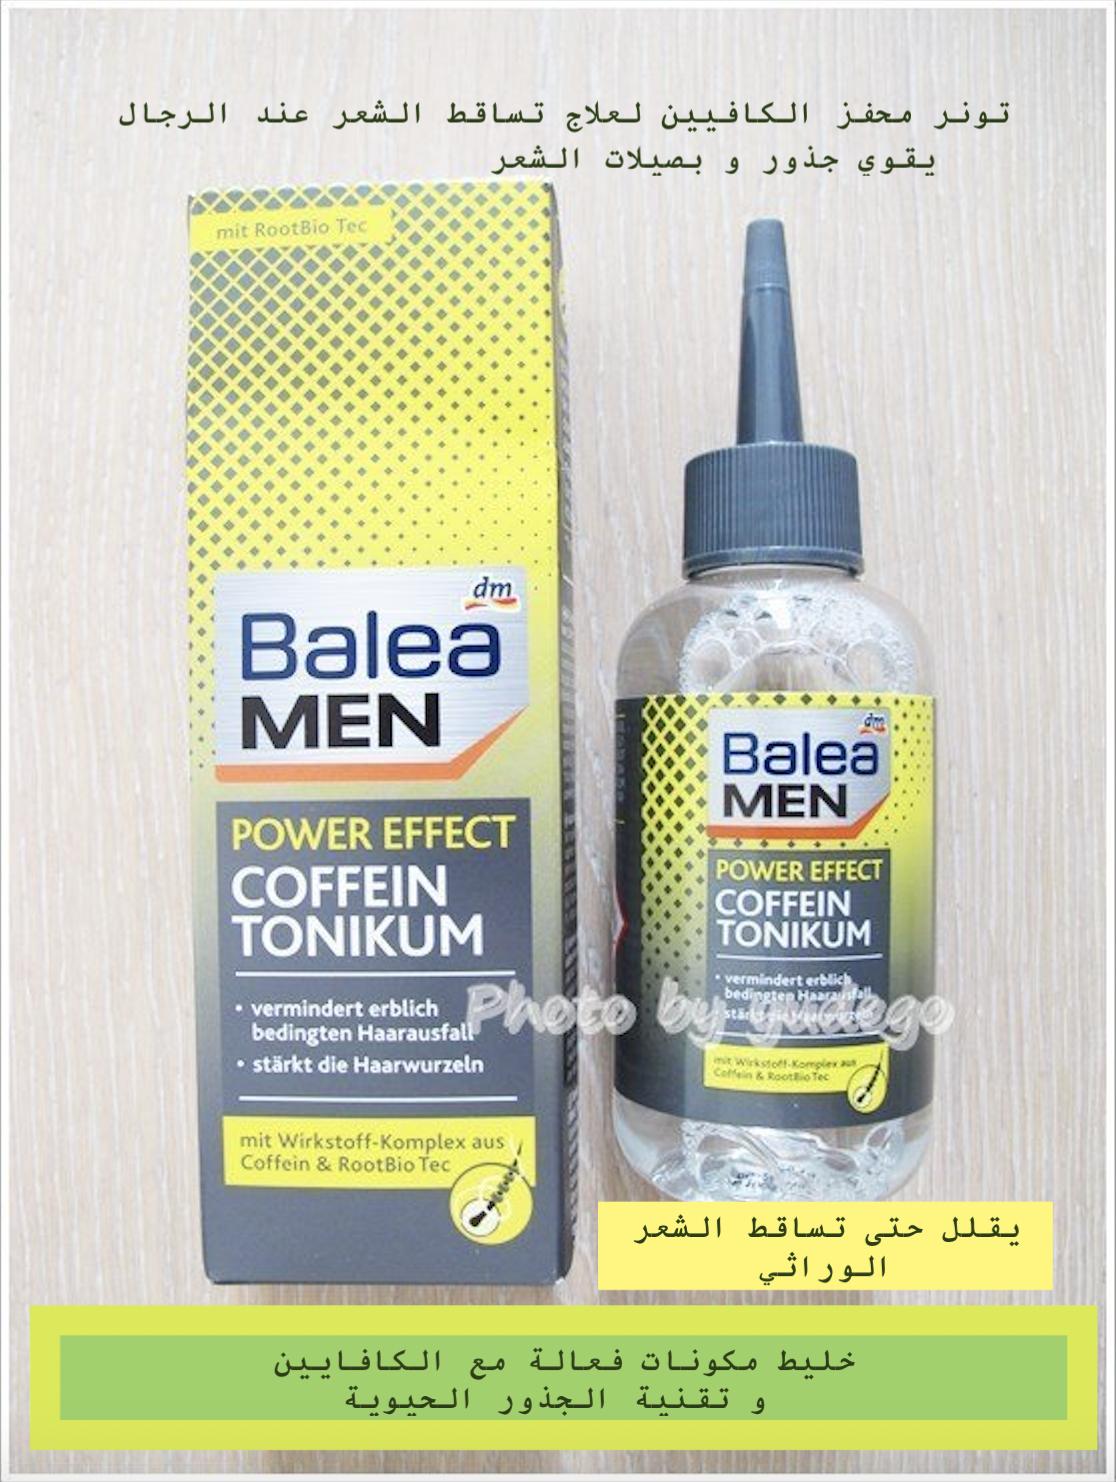 B405 men power effect coffein tonikum 150ml سائل باليه المحفز